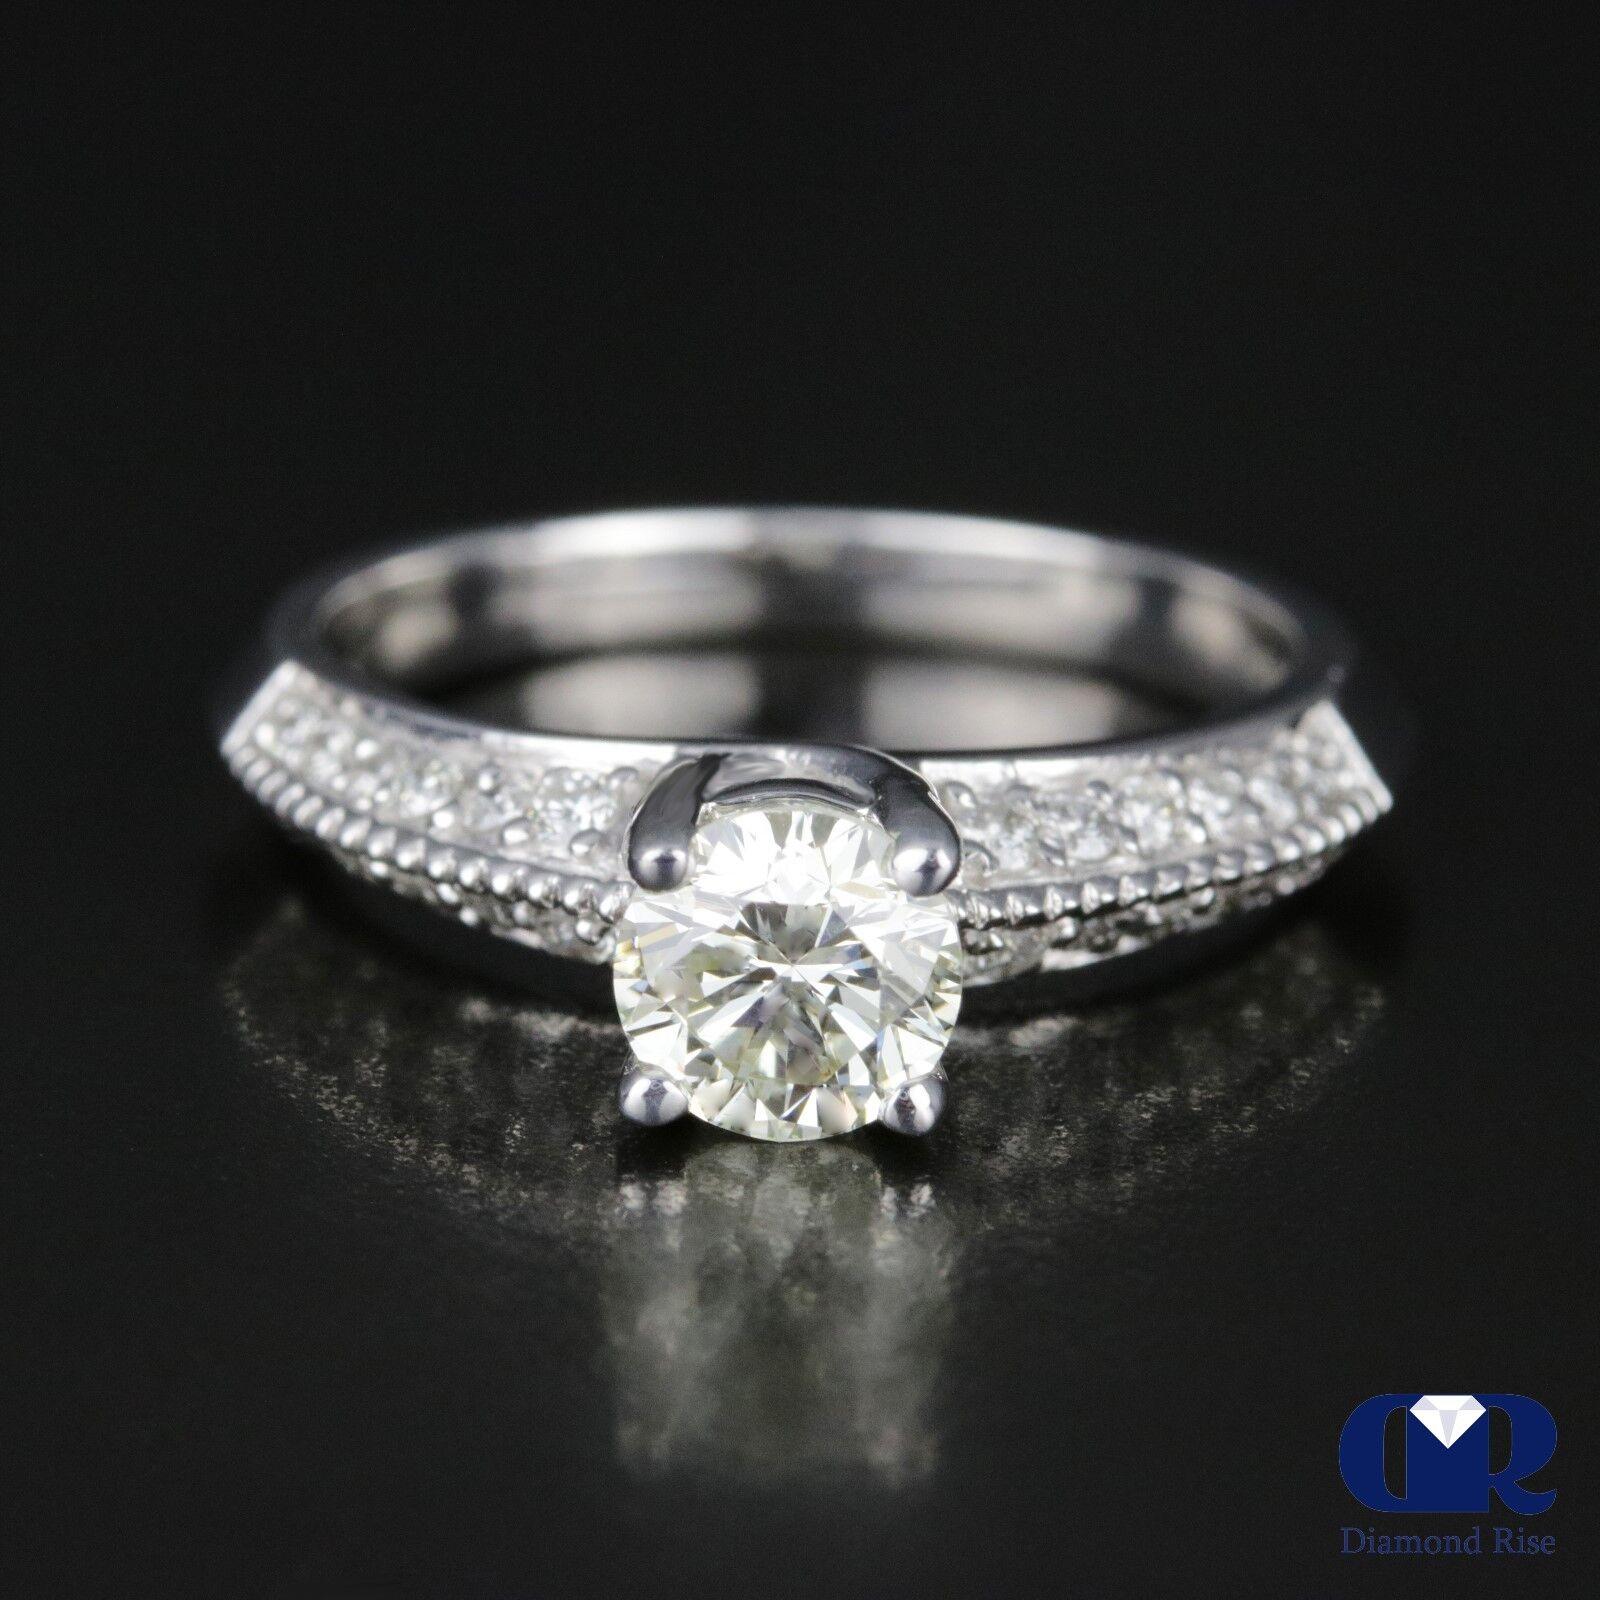 397742985 0.98 Carat Round Cut Diamond Engagement Ring In 14K White Gold | eBay